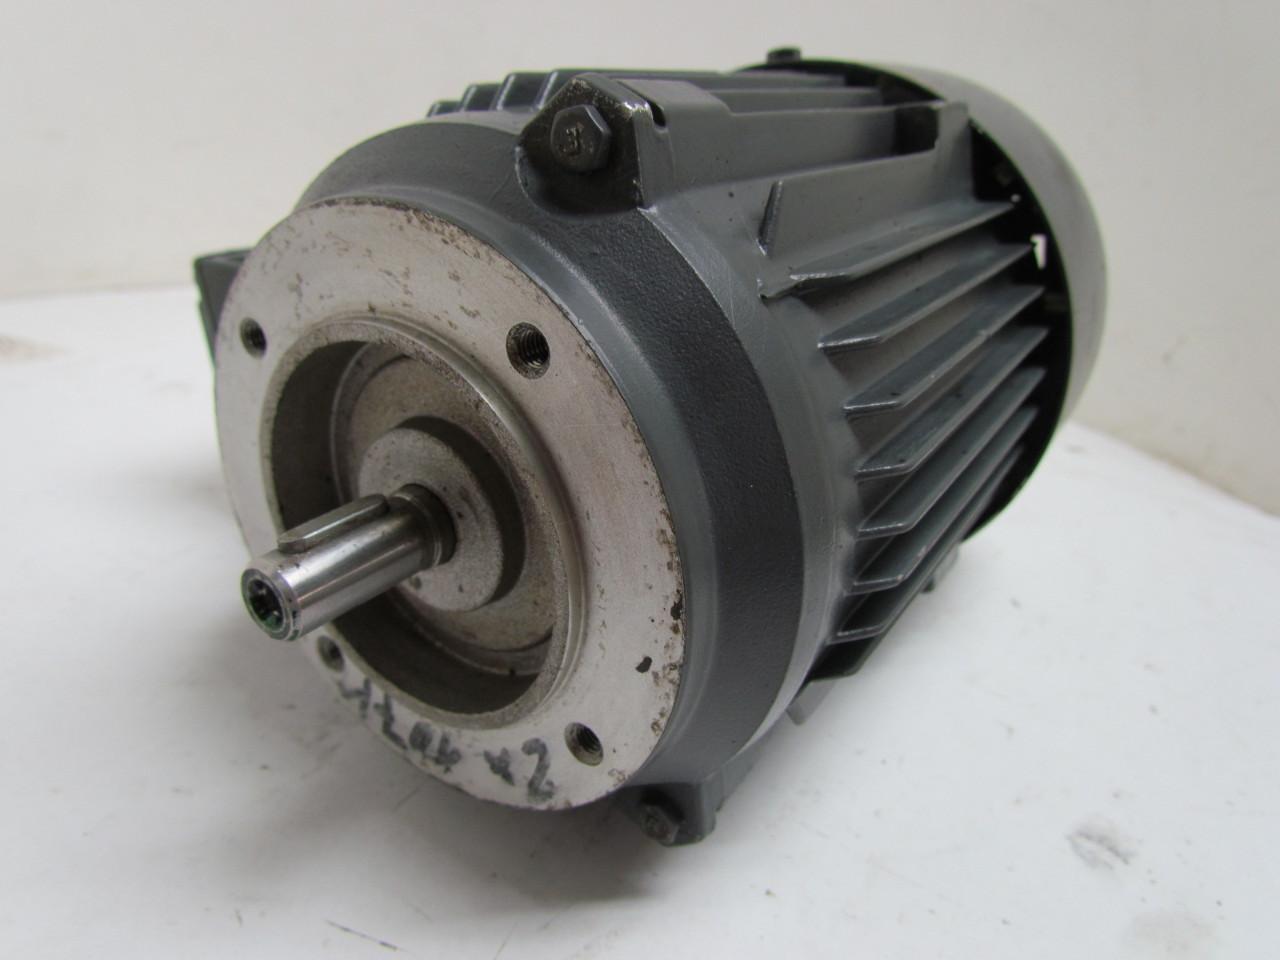 Siemens 2cw5 167 1 Z D363 1892 01 Iec 63 Frame Motor